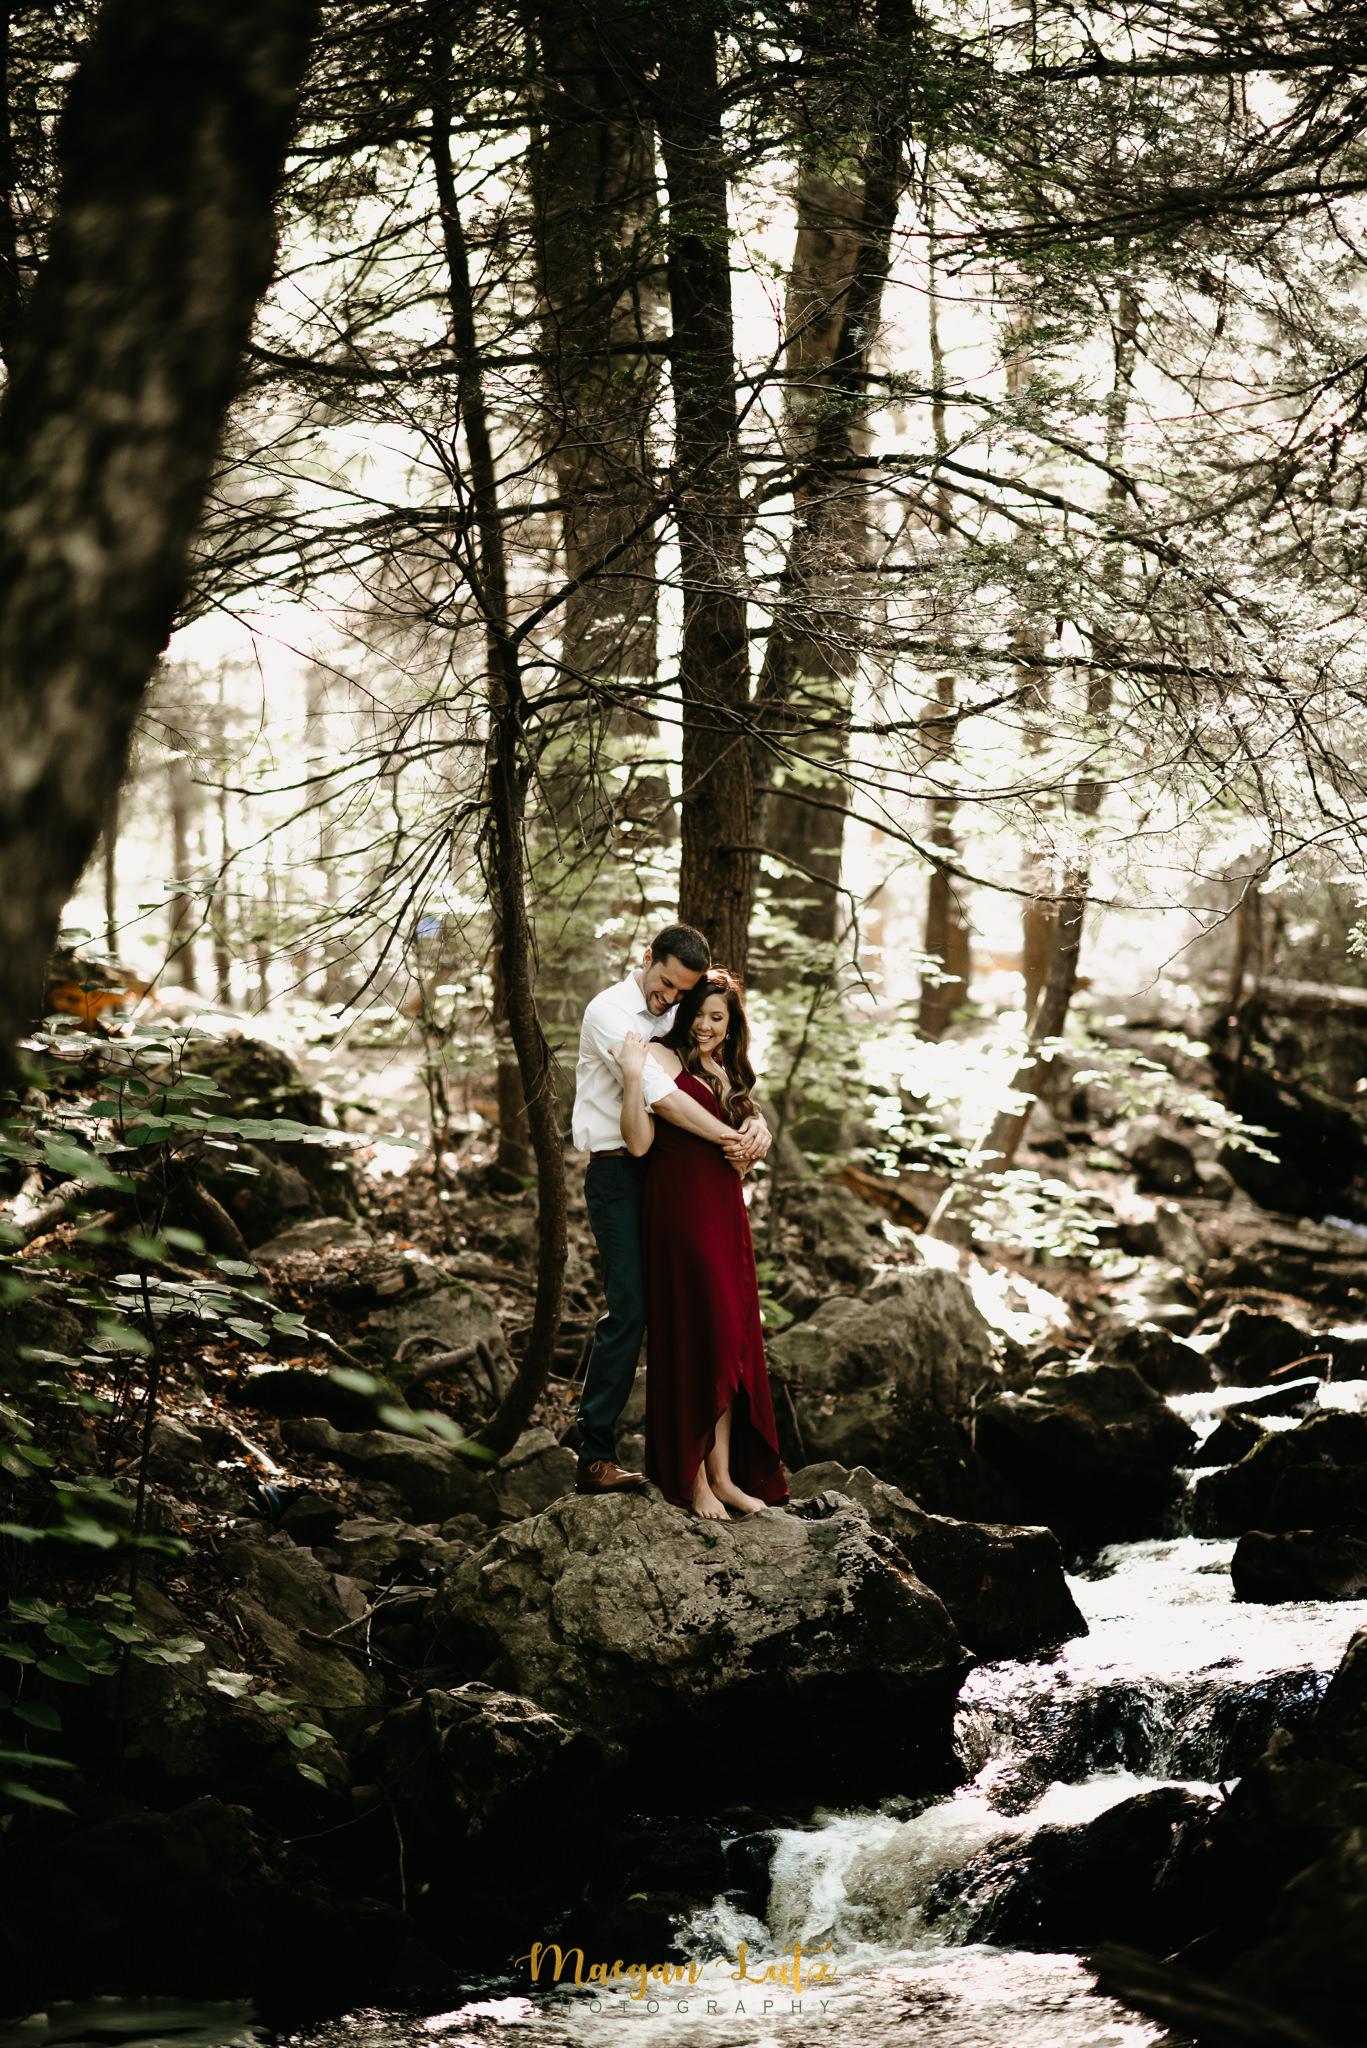 NEPA-Engagement-Wedding-Photographer-Session-at-Ricketts-Glen-State-Park-4.jpg